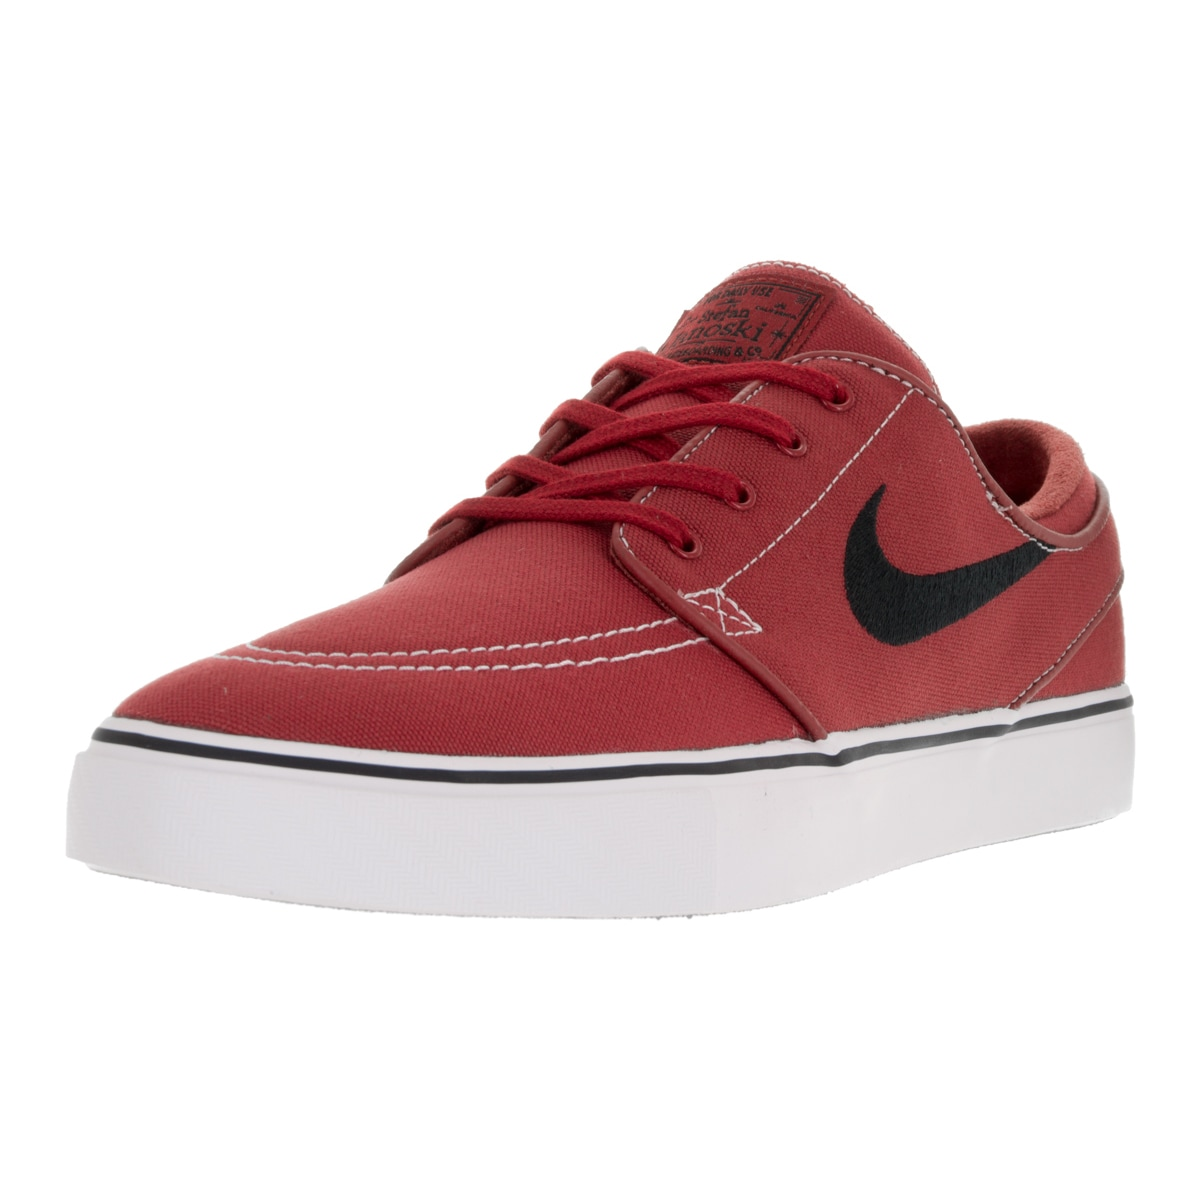 Nike Men's Zoom Stefan Janoski Red Canvas Skate Shoe (As ...